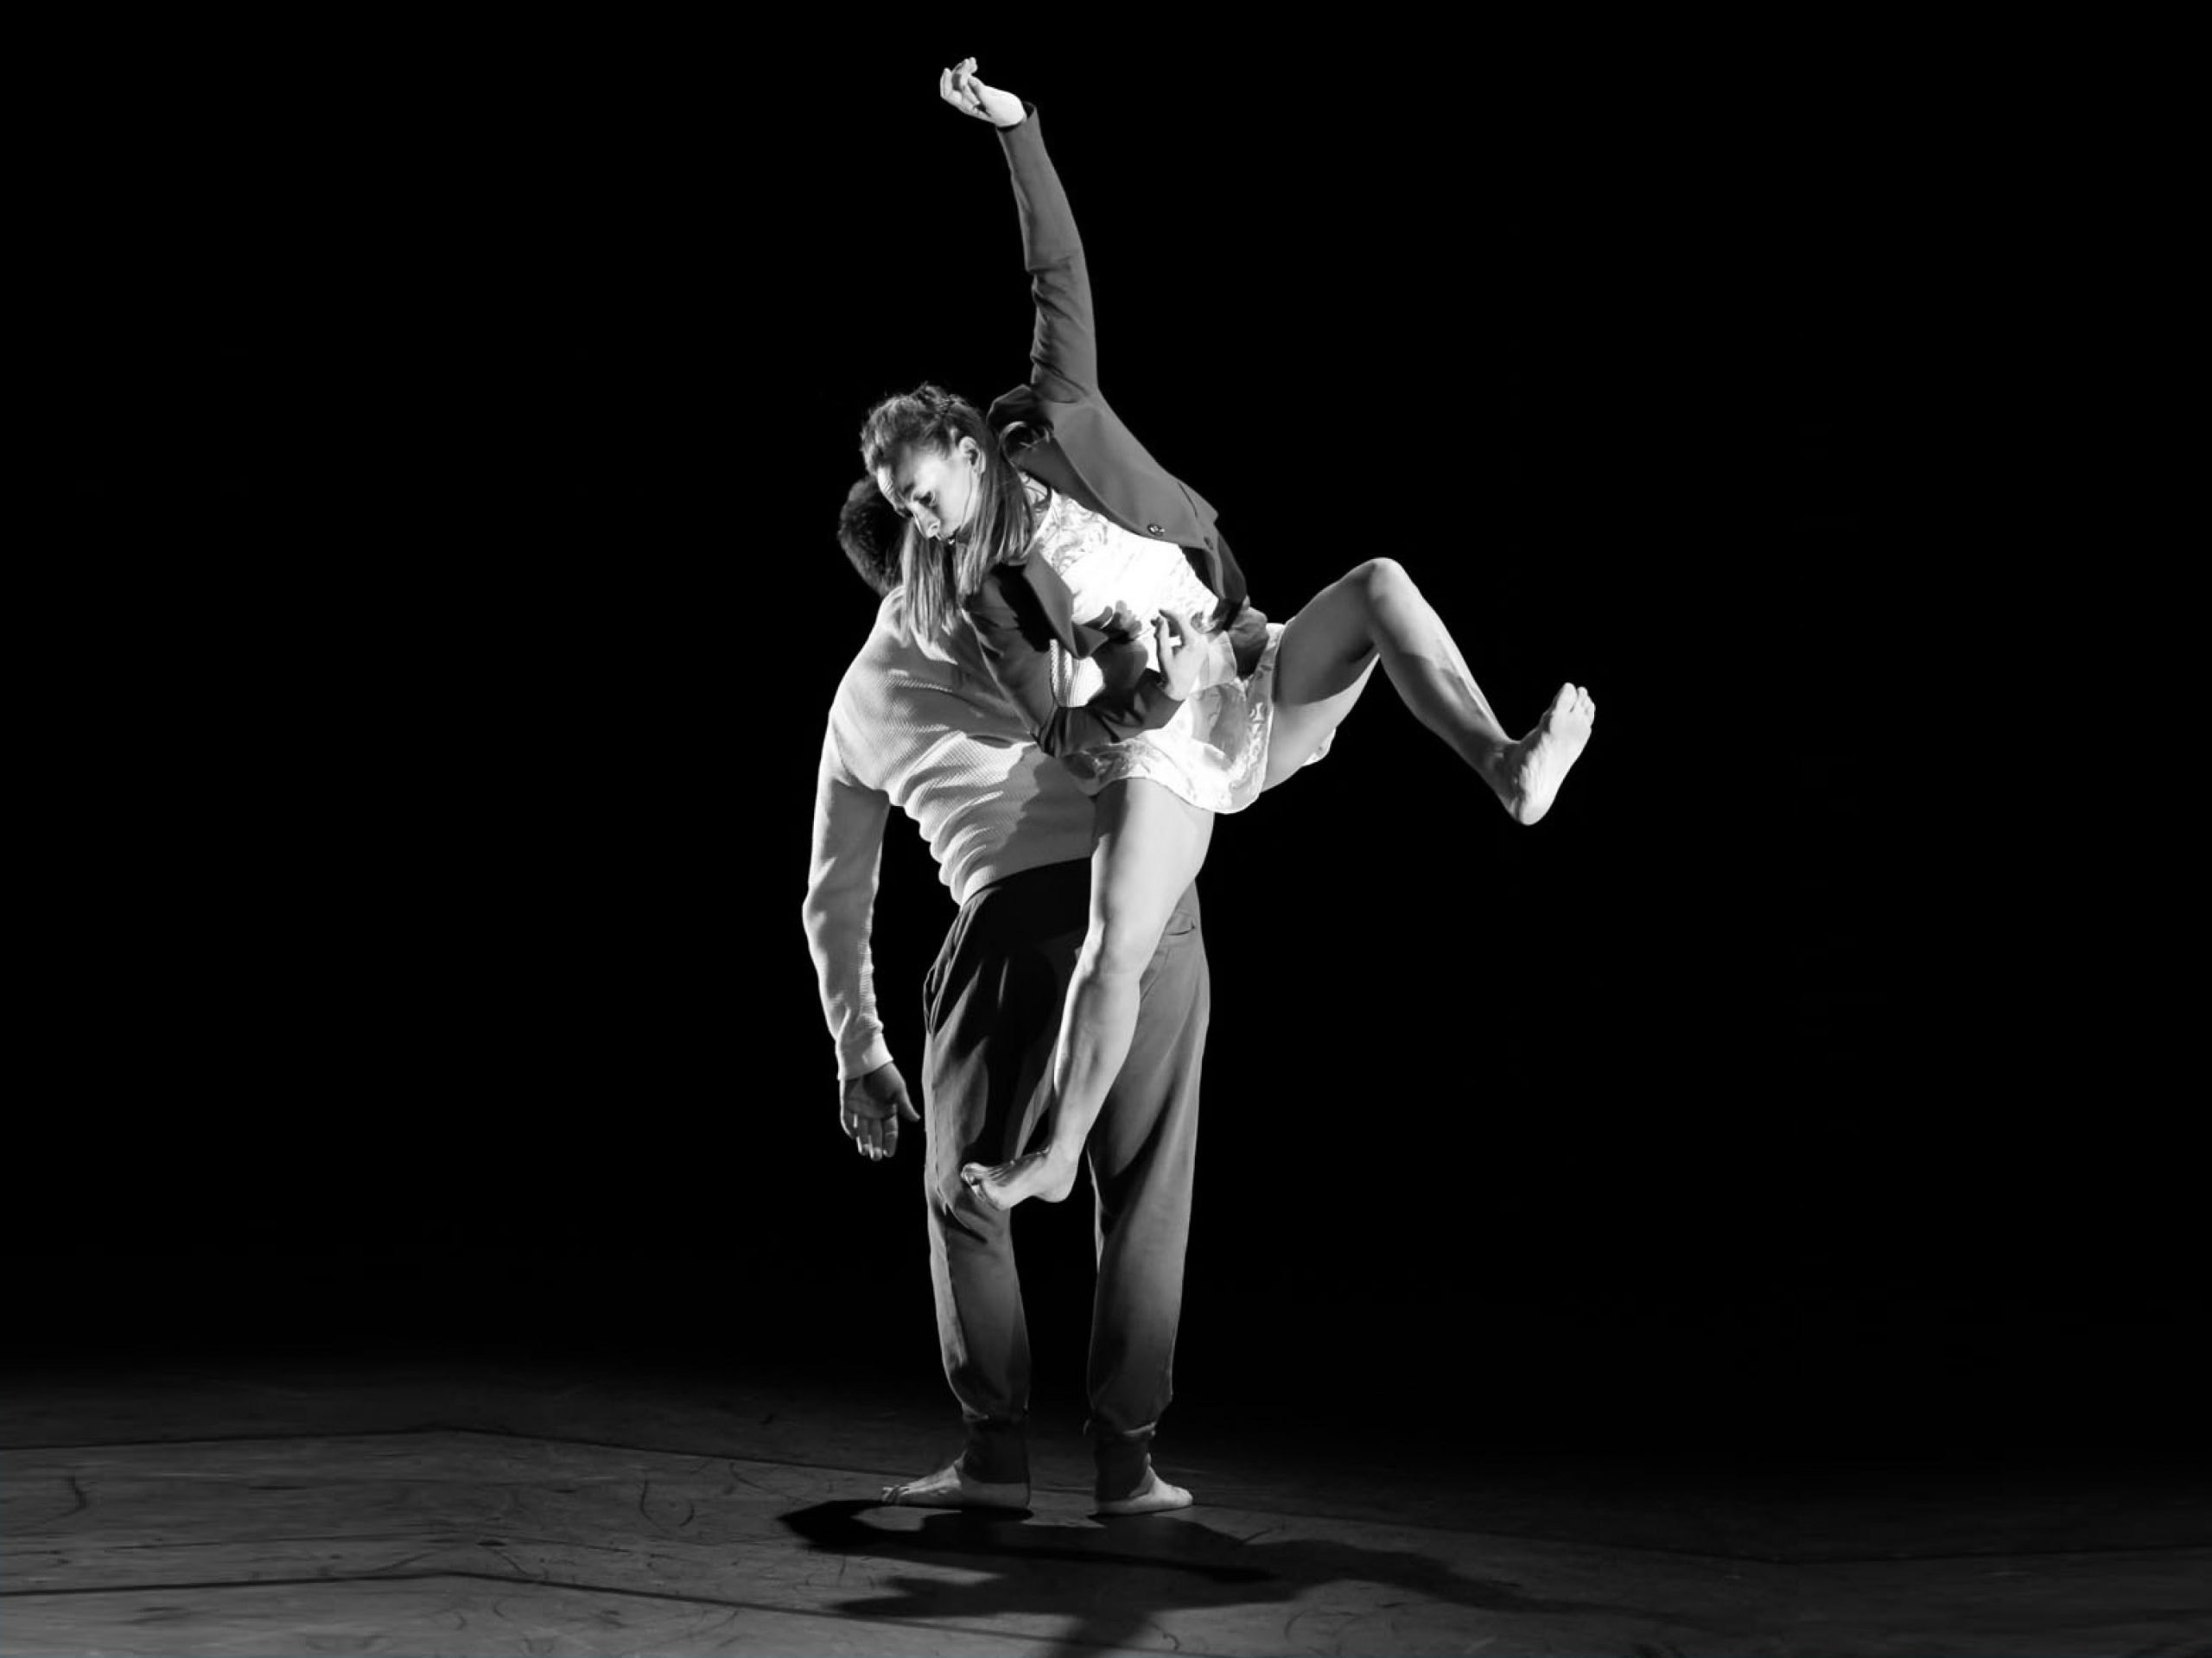 Company V Balletschool Veronique lenaers_ slider 11